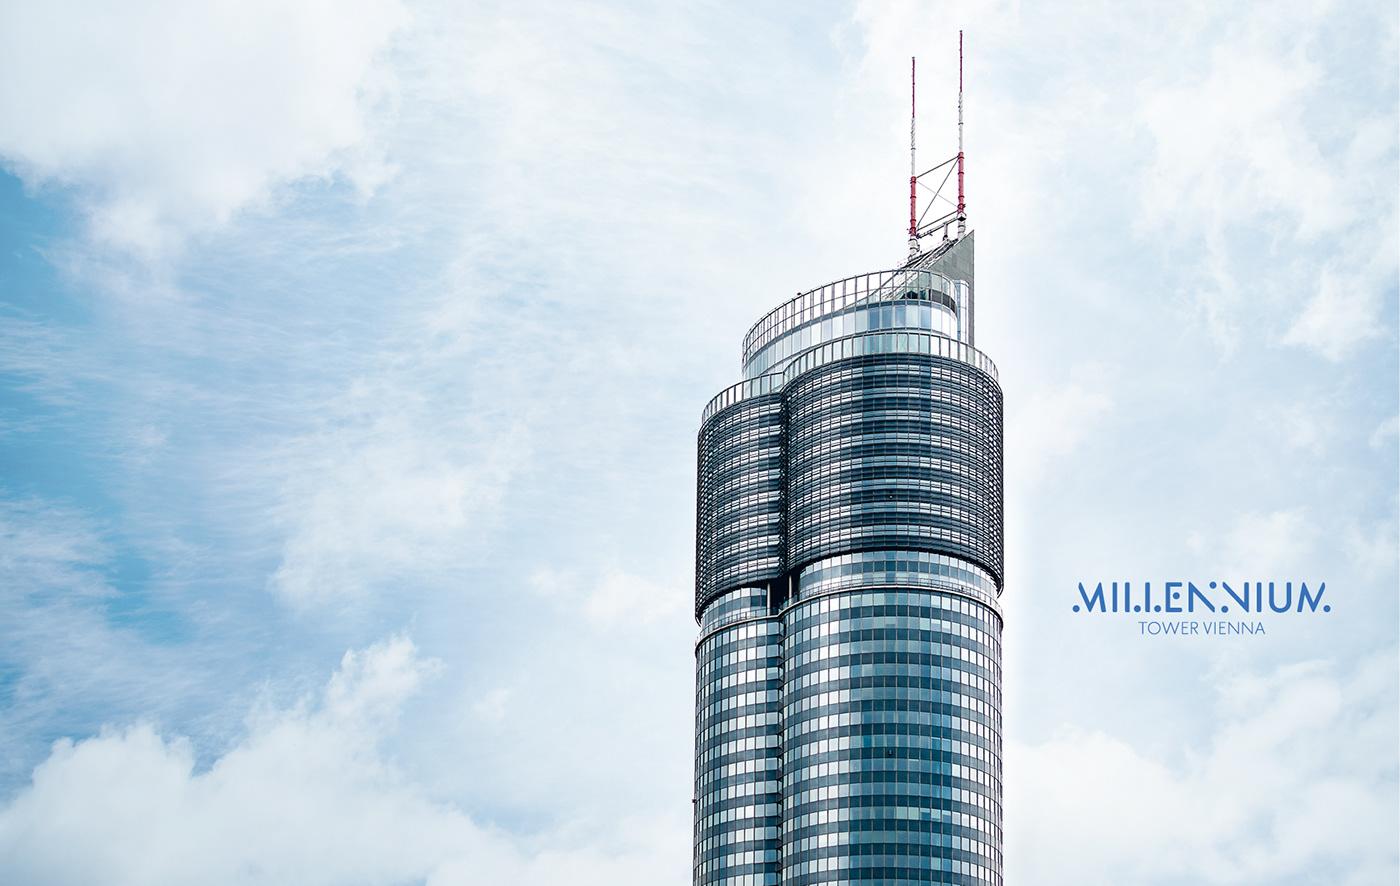 editorial design  Creative Direction  vienna Millennium Tower Photography  strategy Roommmetsfreiland real estate skyscraper ILLUSTRATION